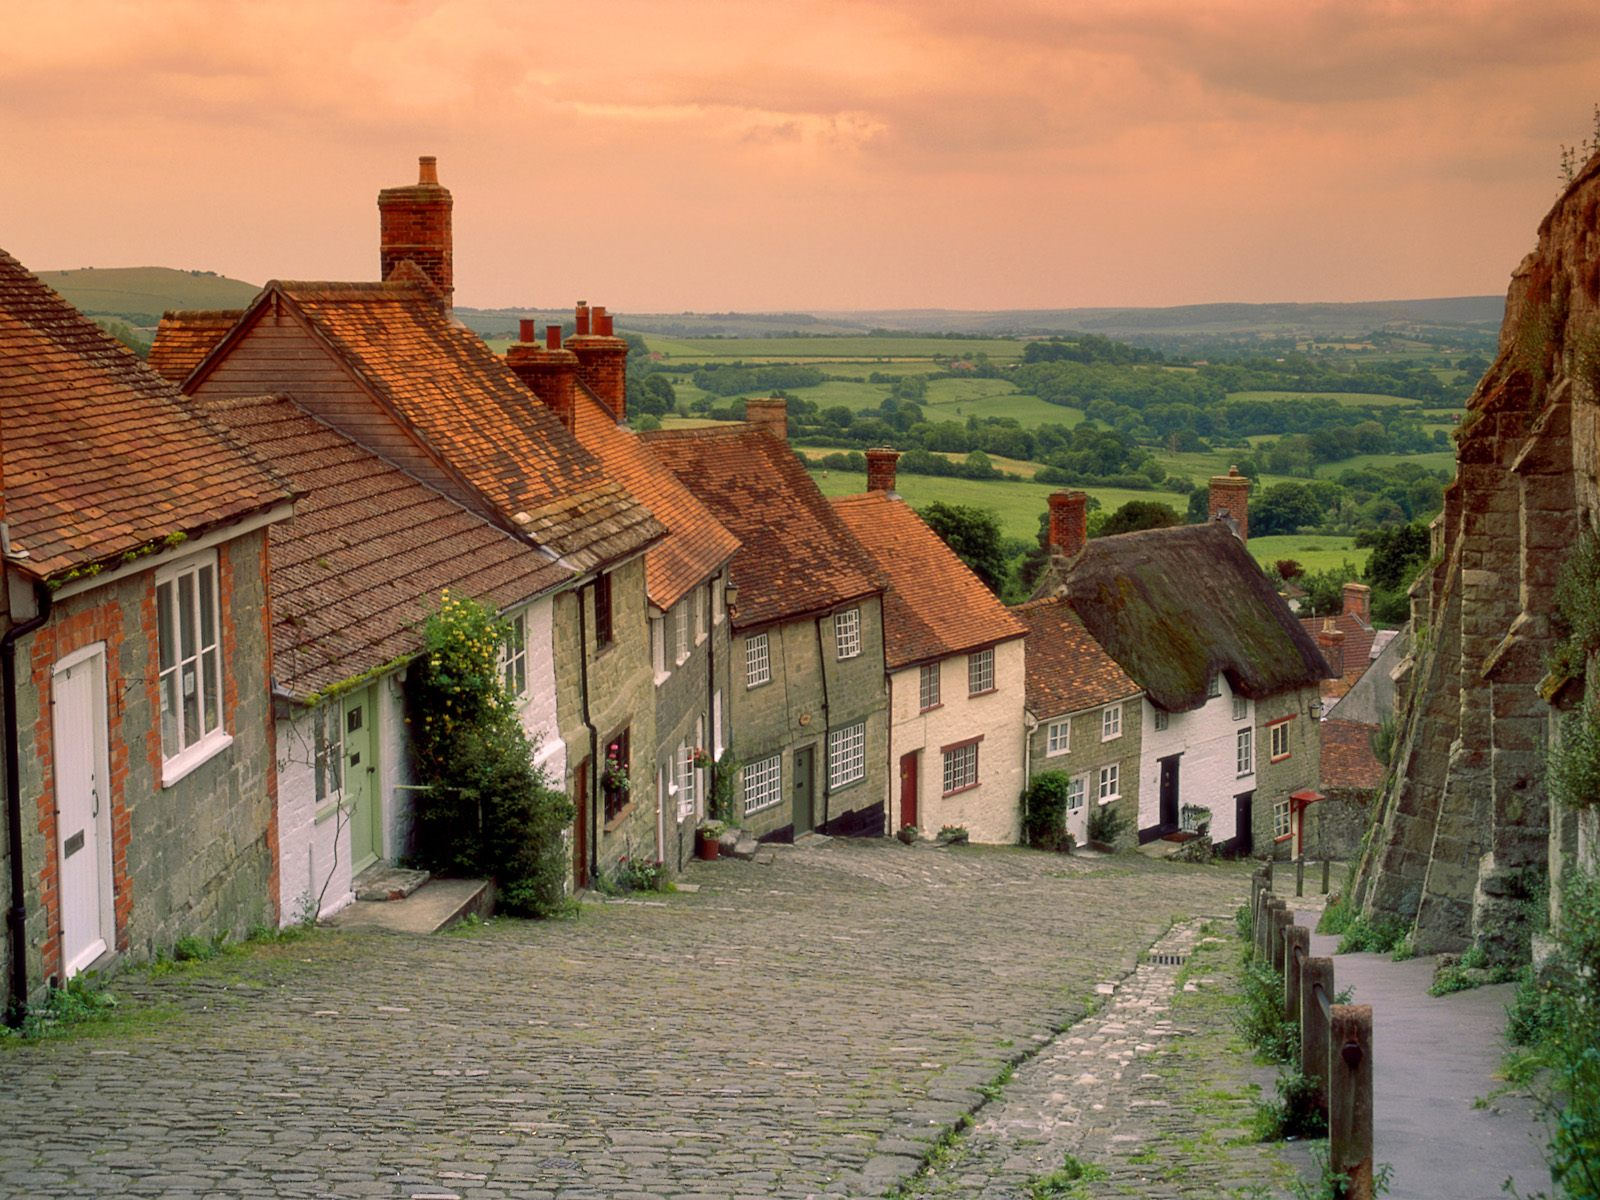 http://2.bp.blogspot.com/_aWMnfa5g5E0/TMZjOz6Wv5I/AAAAAAAAA_s/ydjbURIqNUs/s1600/Gold+Hill+Cottages,+Shaftesbury,+England.jpg